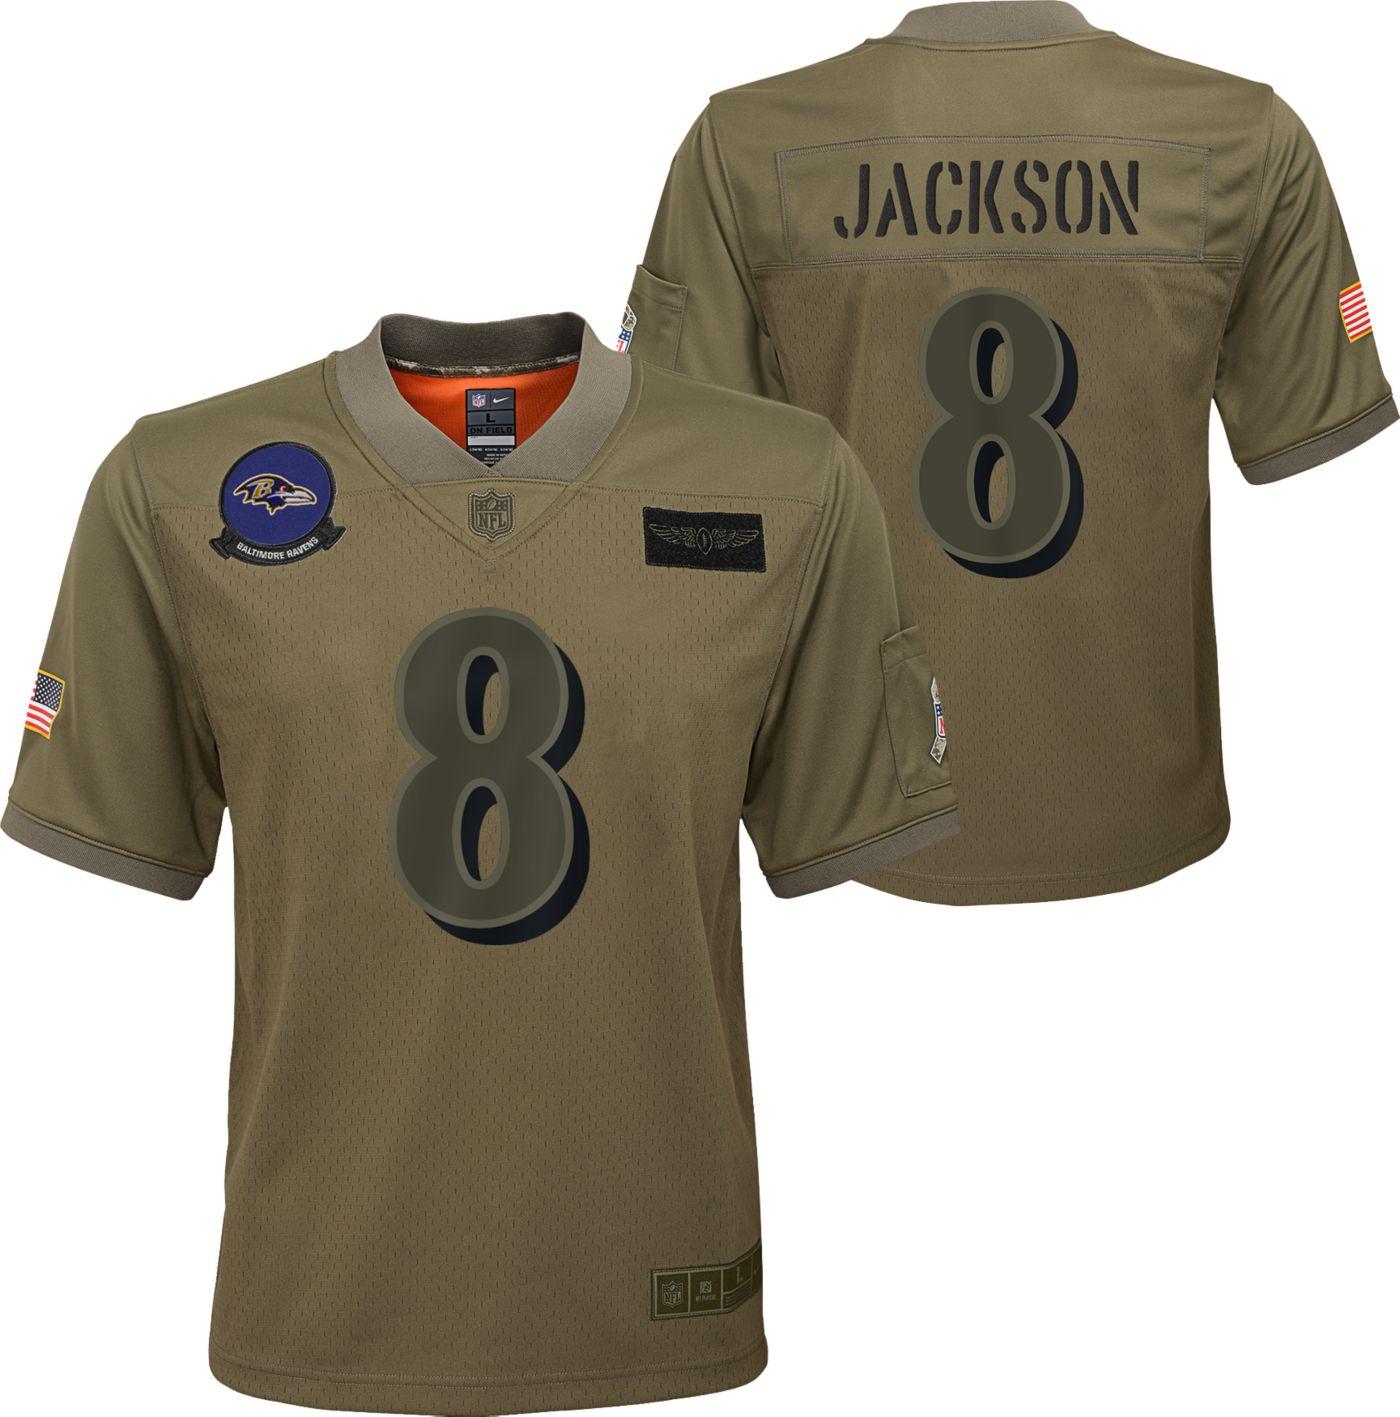 Nike Youth Salute to Service Baltimore Ravens Lamar Jackson #8 Olive Game Jersey